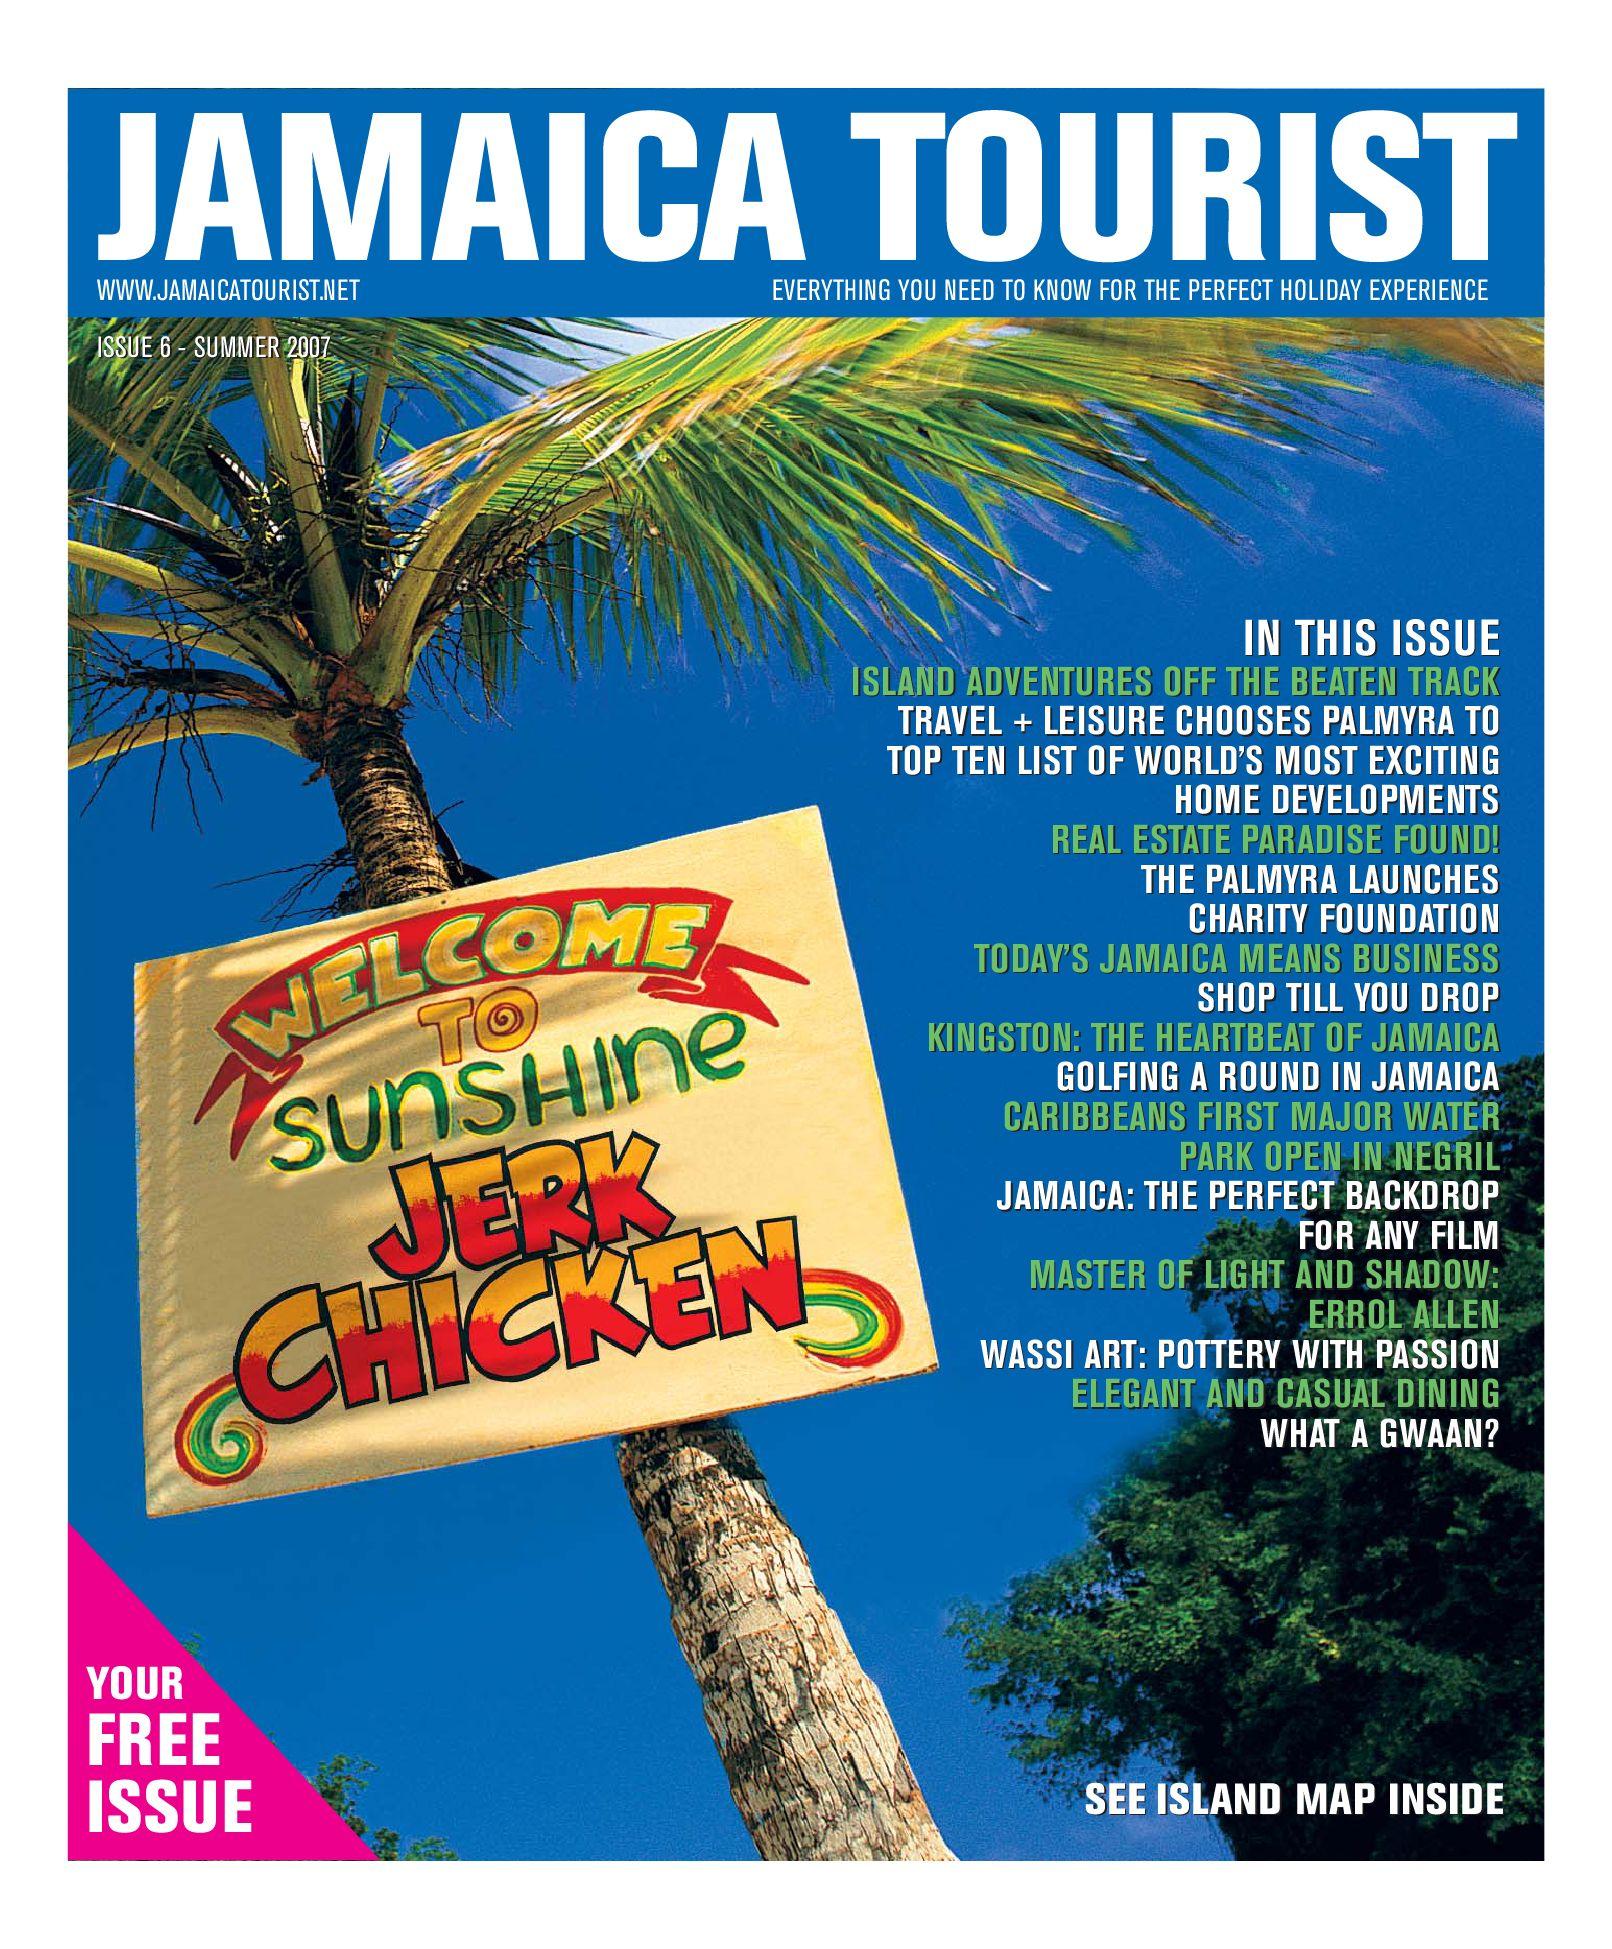 Jamaica Tourist Issue 6 By Jamaica Tourist